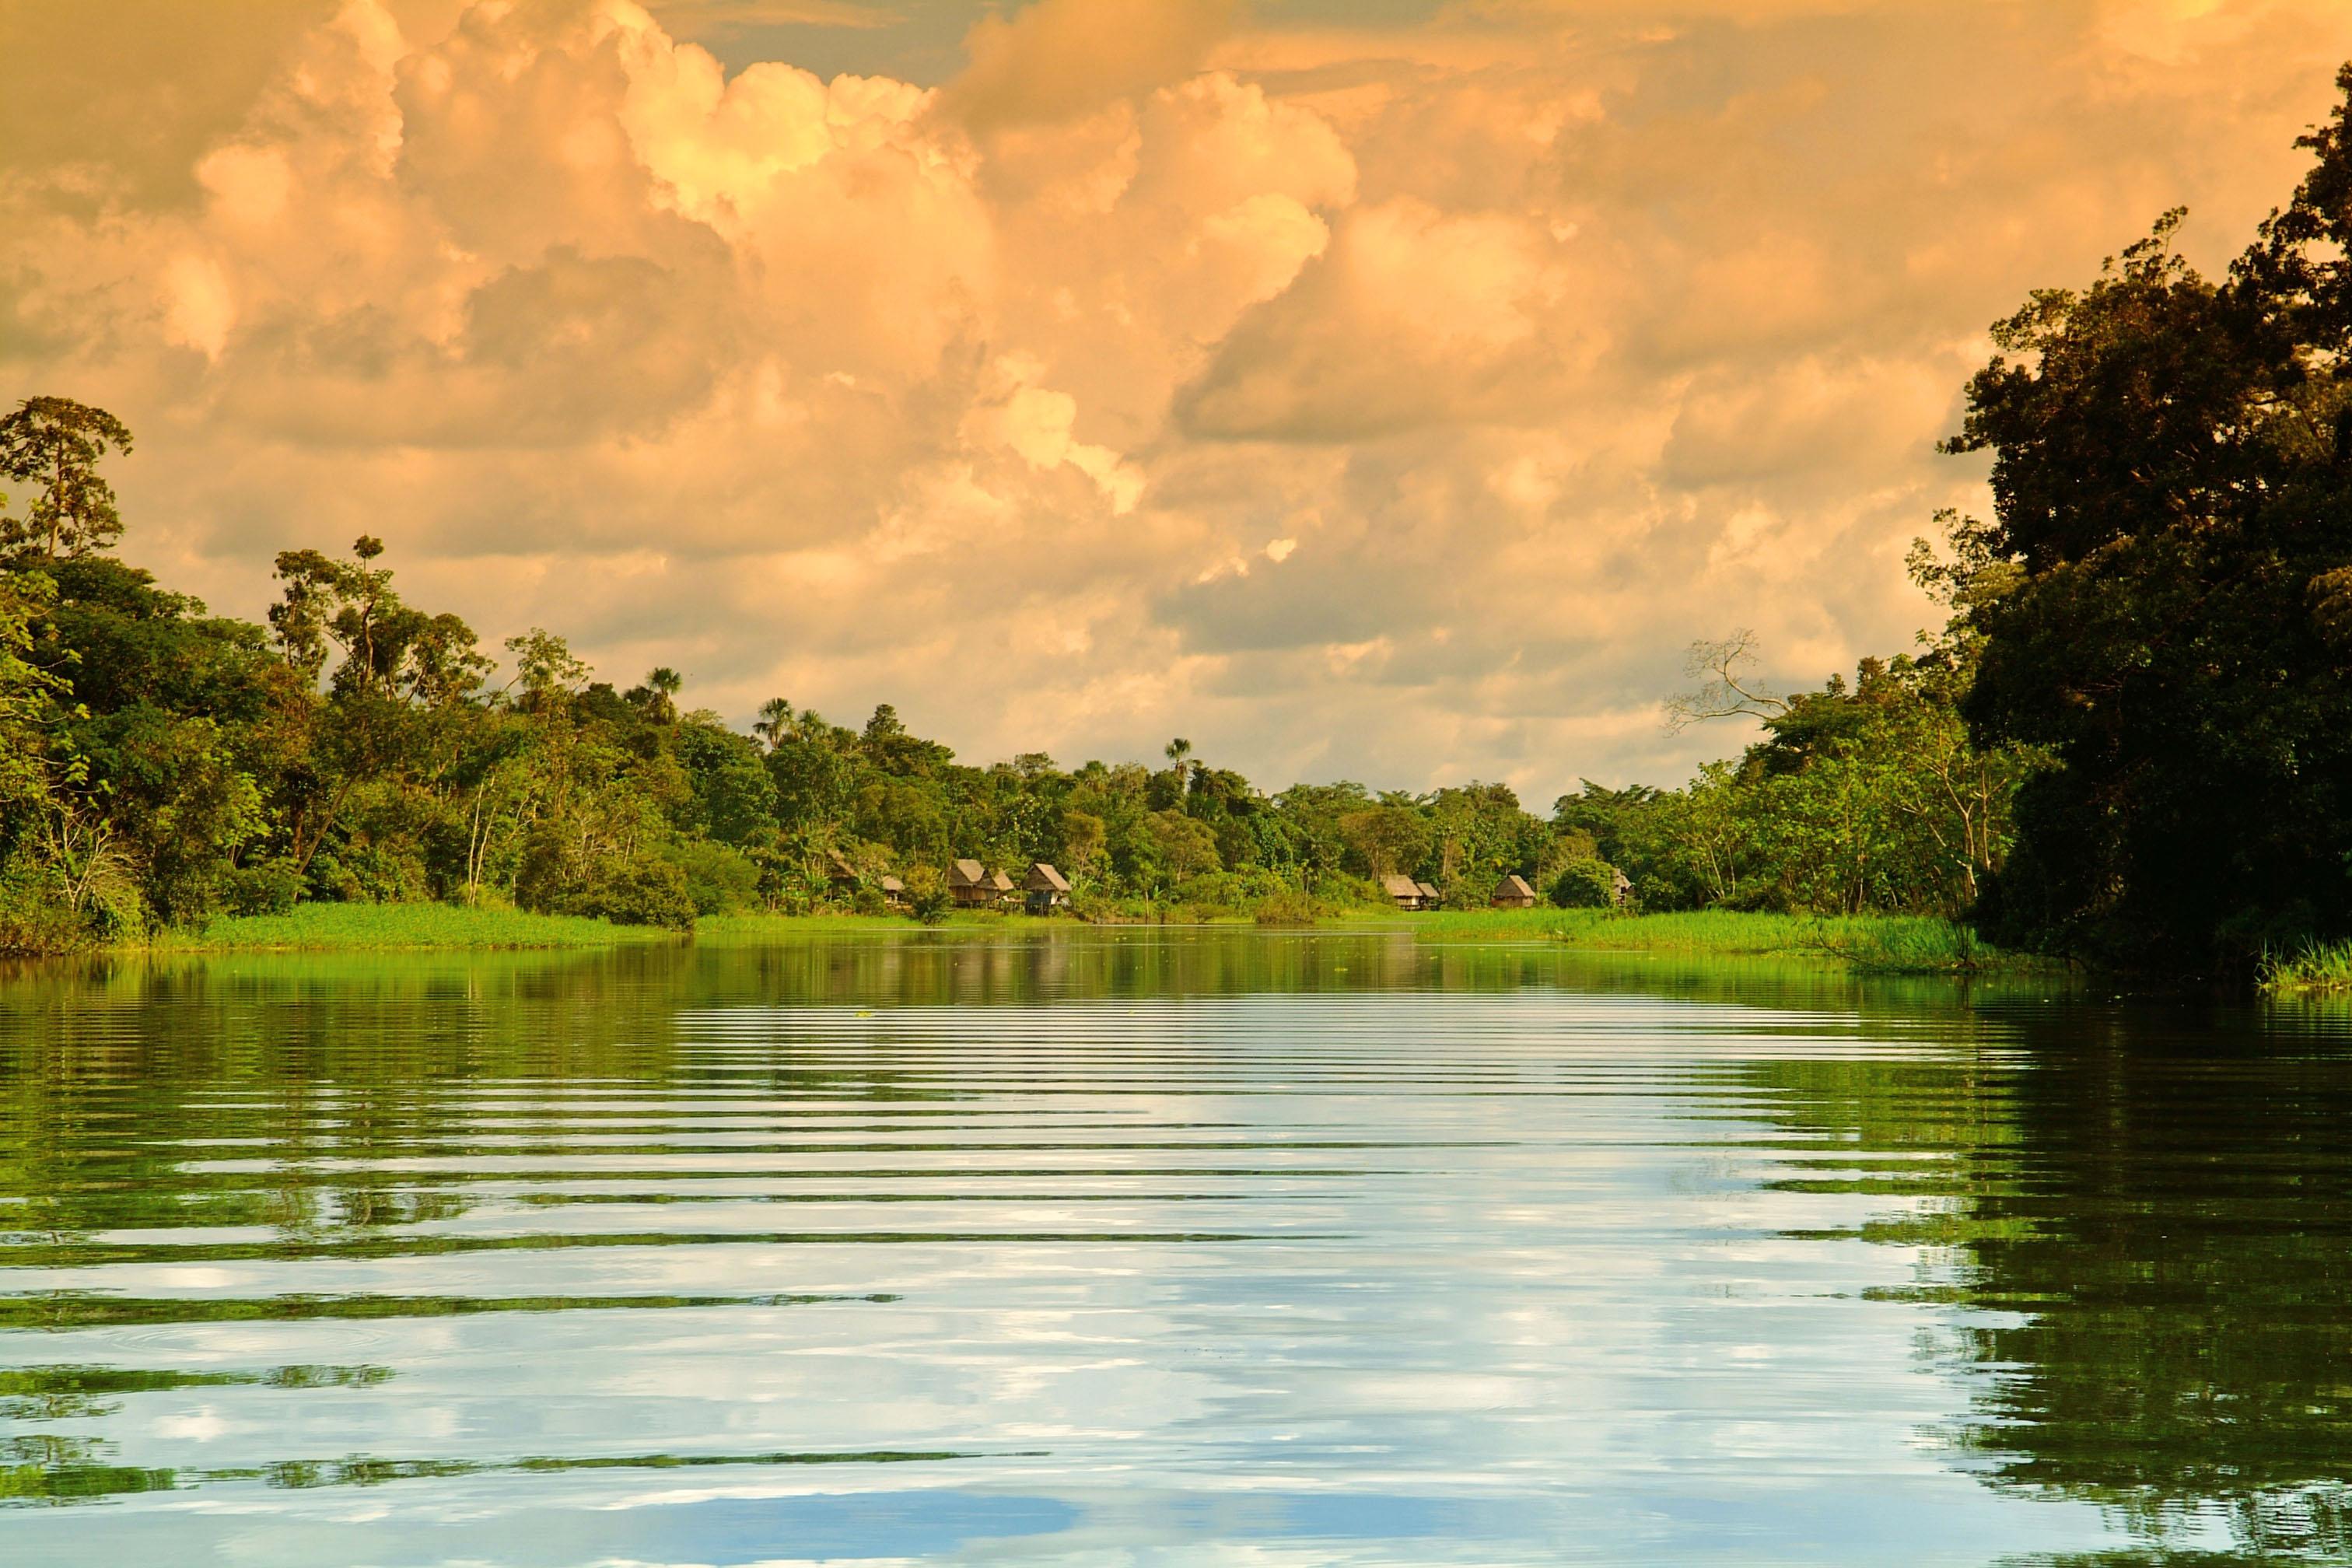 Amazon Cruise Peru Aria Amazon 7 Nights River Cruise - Low Water